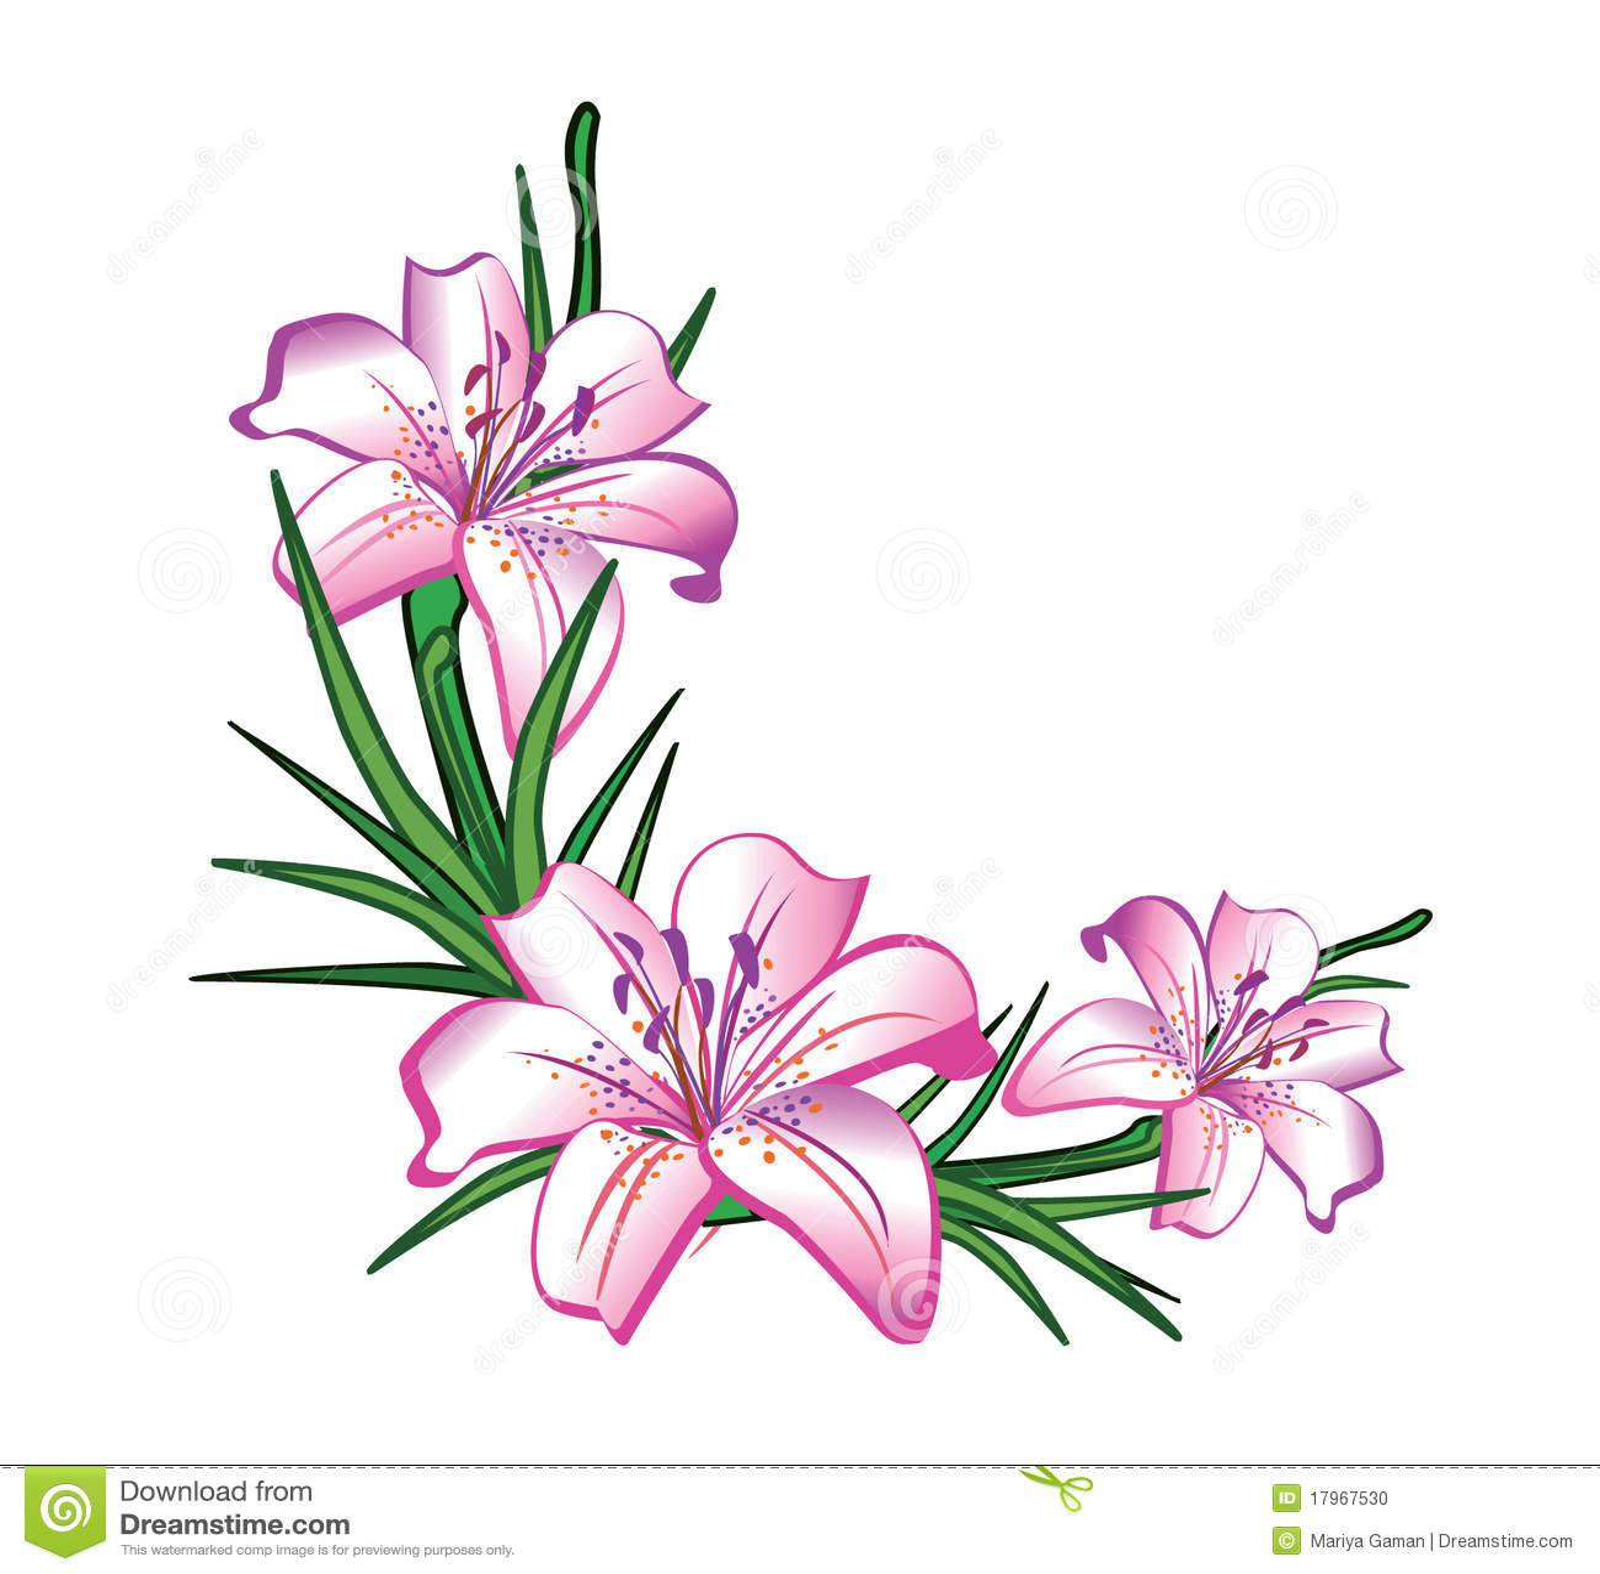 Flower Arrangement Stock Vector Illustration Of Flowerbed 17967530